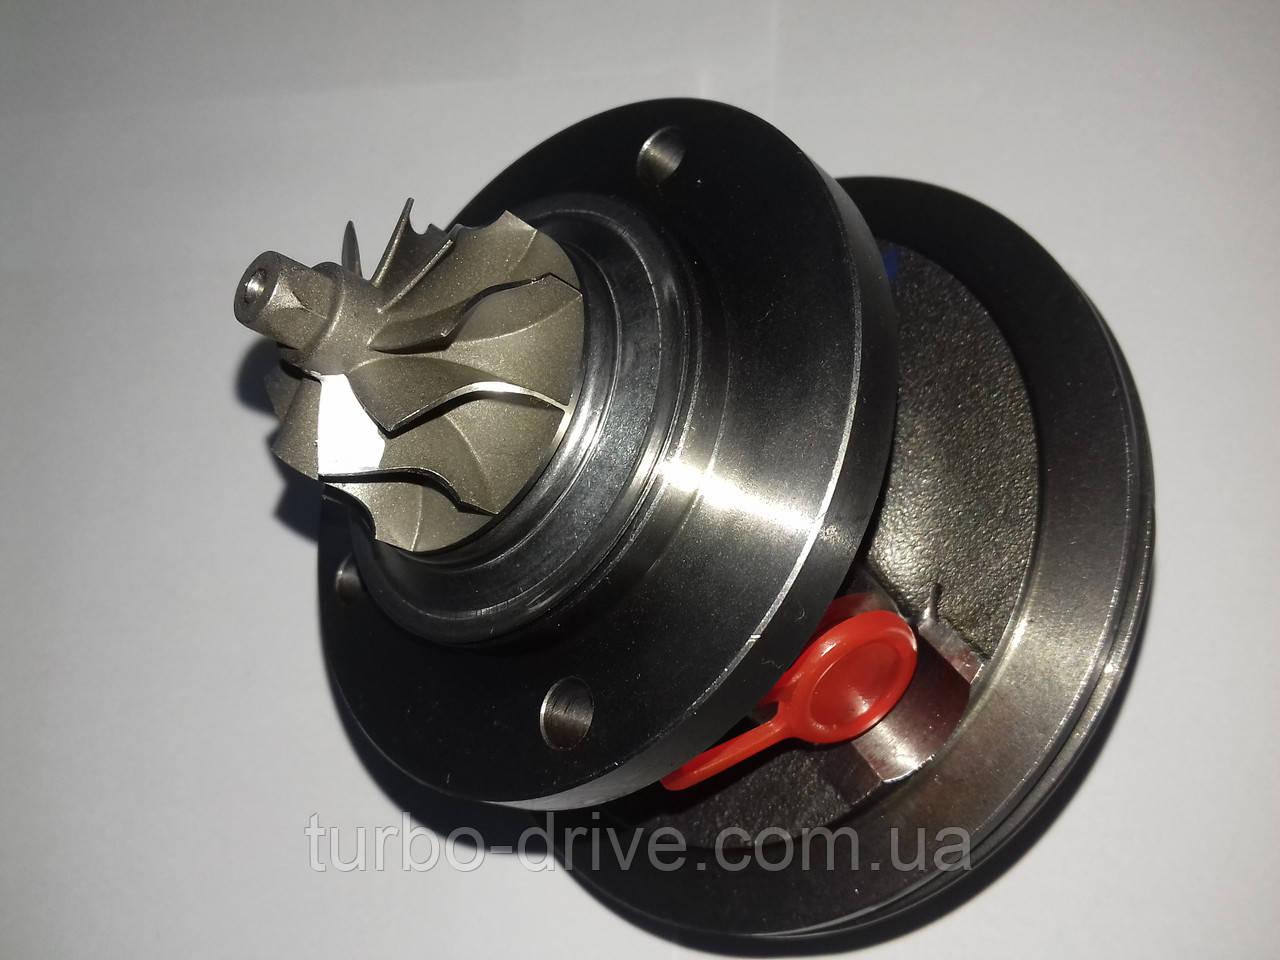 Картридж турбины Fiat Idea 1.3 JTD